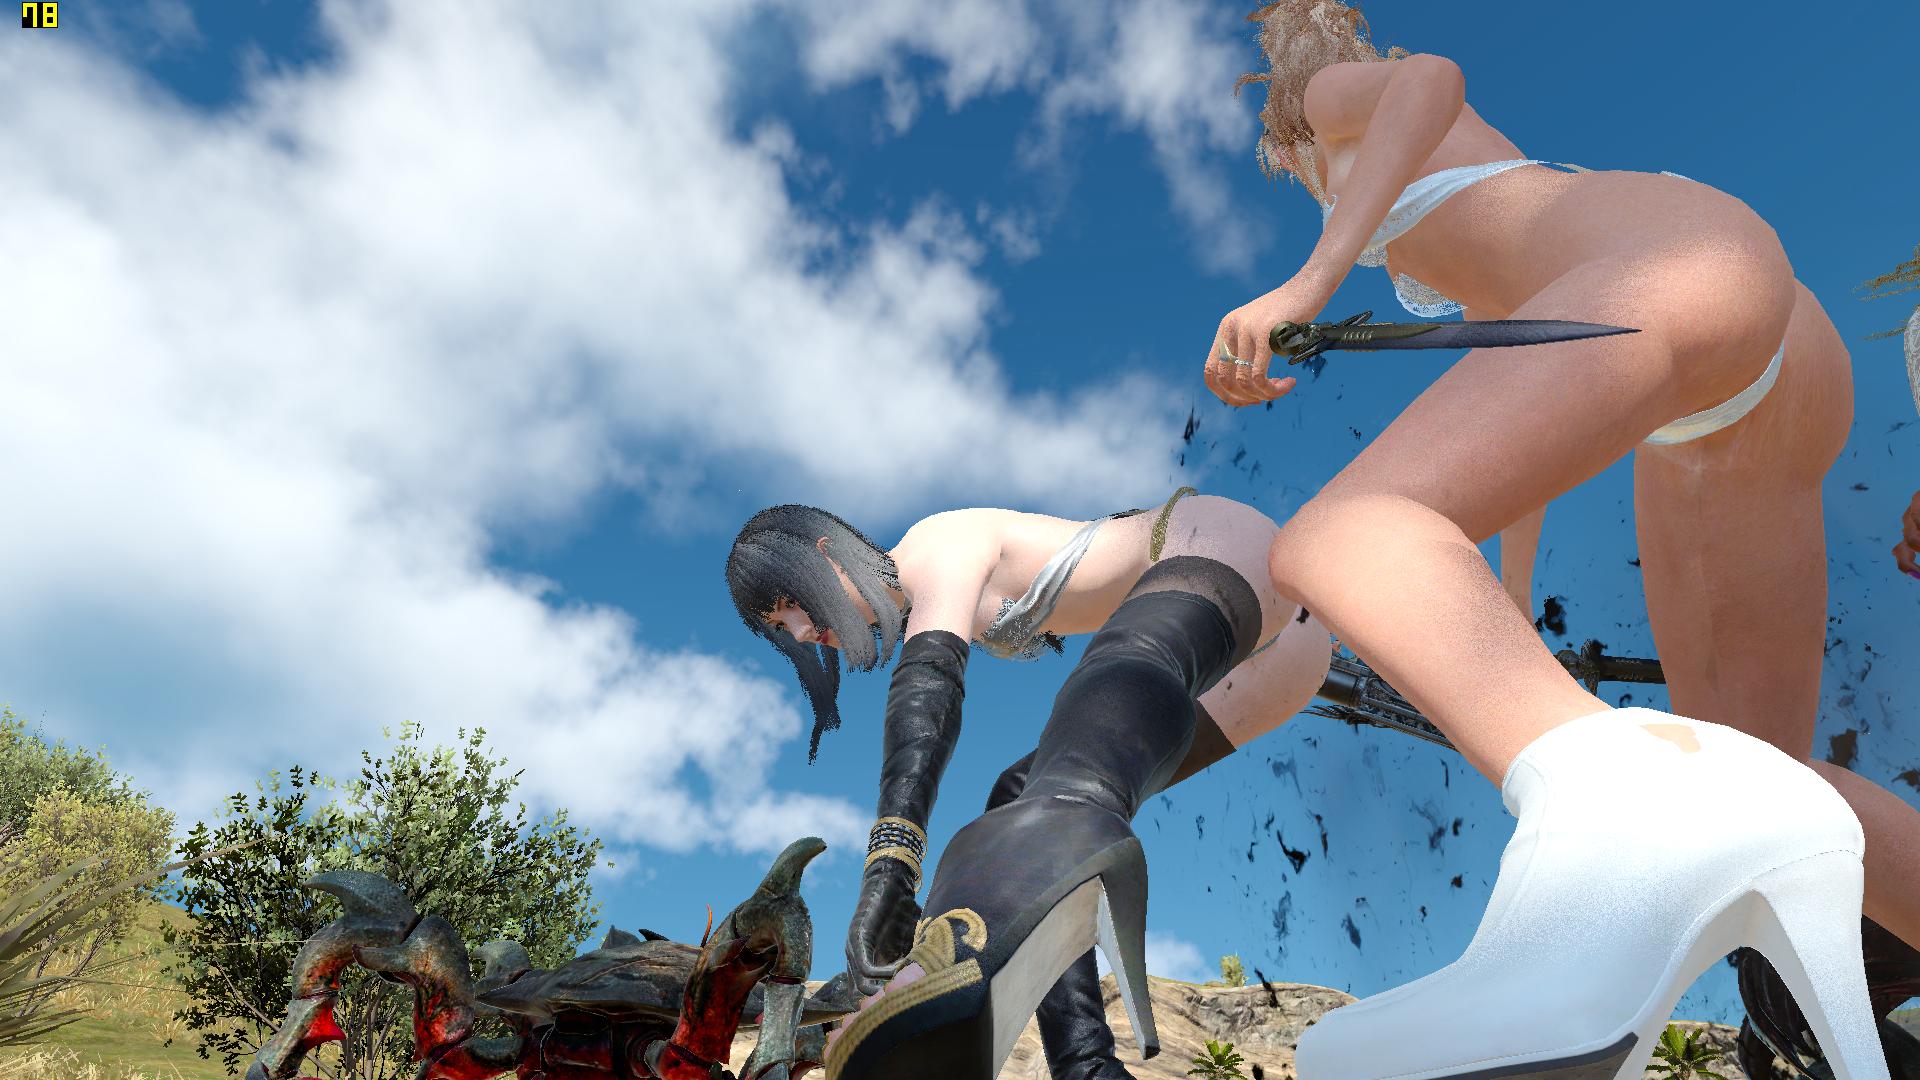 Final Fantasy XV Windows Edition Screenshot 2019.01.15 - 19.42.58.22.png